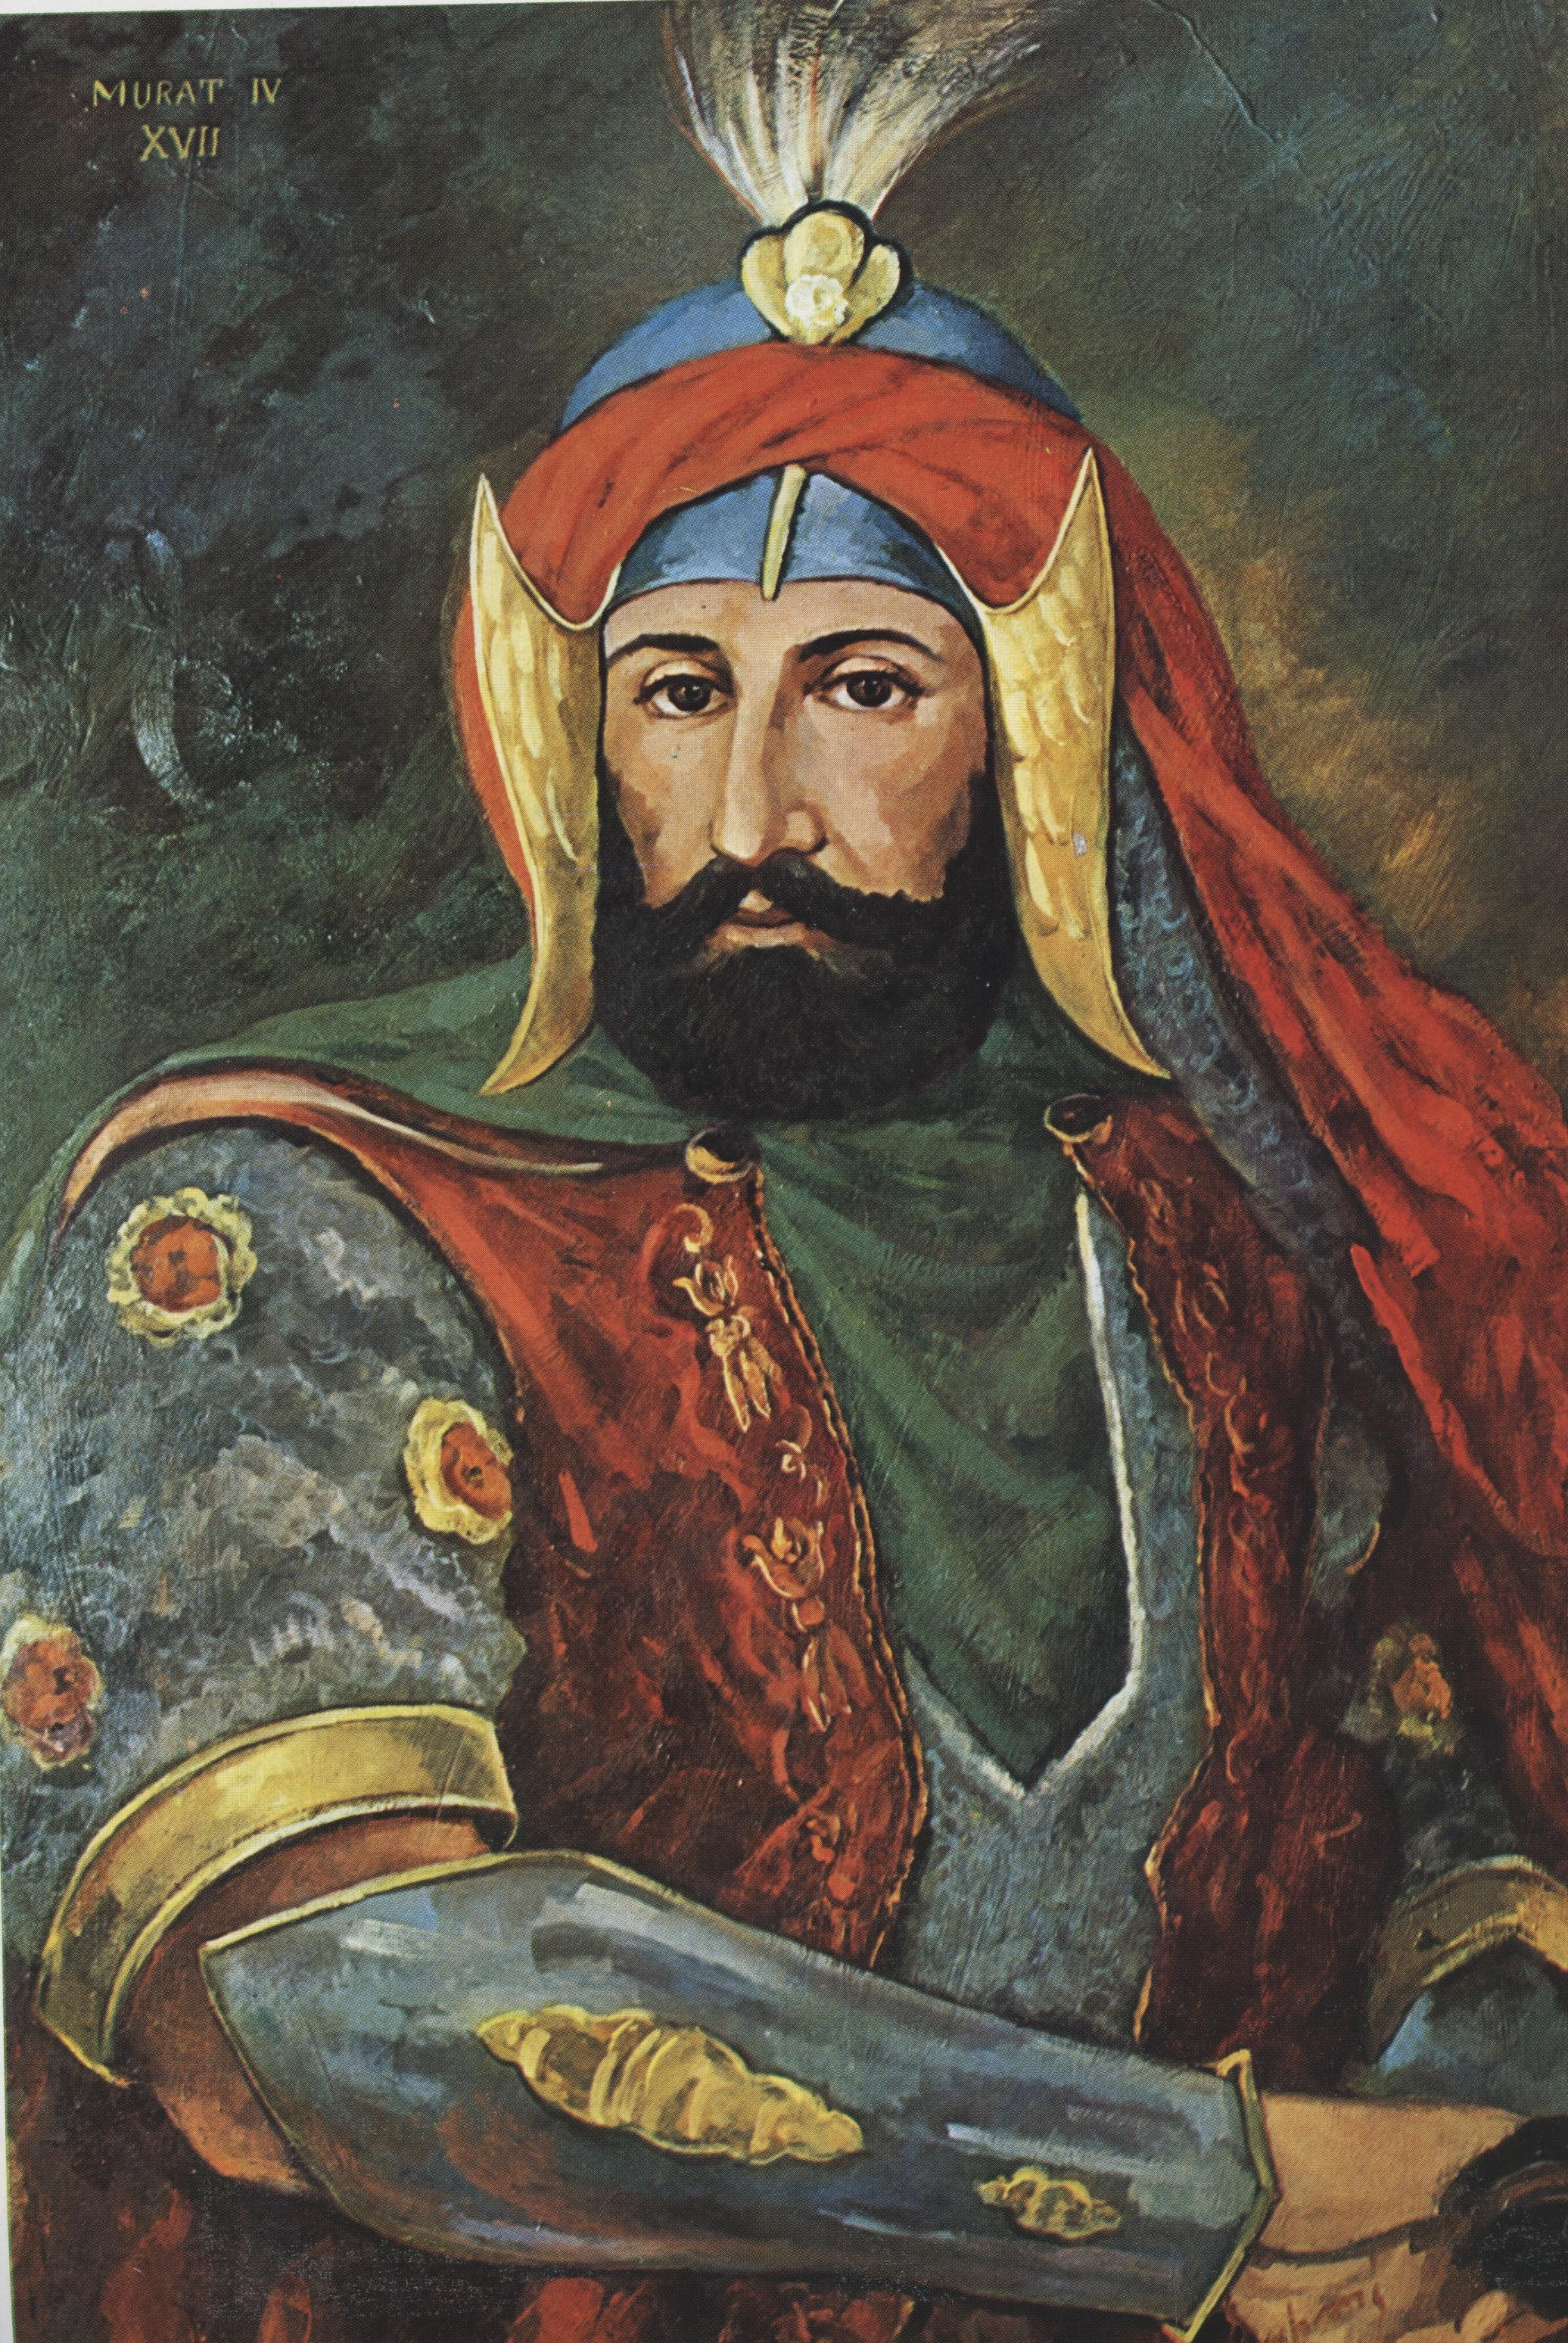 Depiction of Murad IV